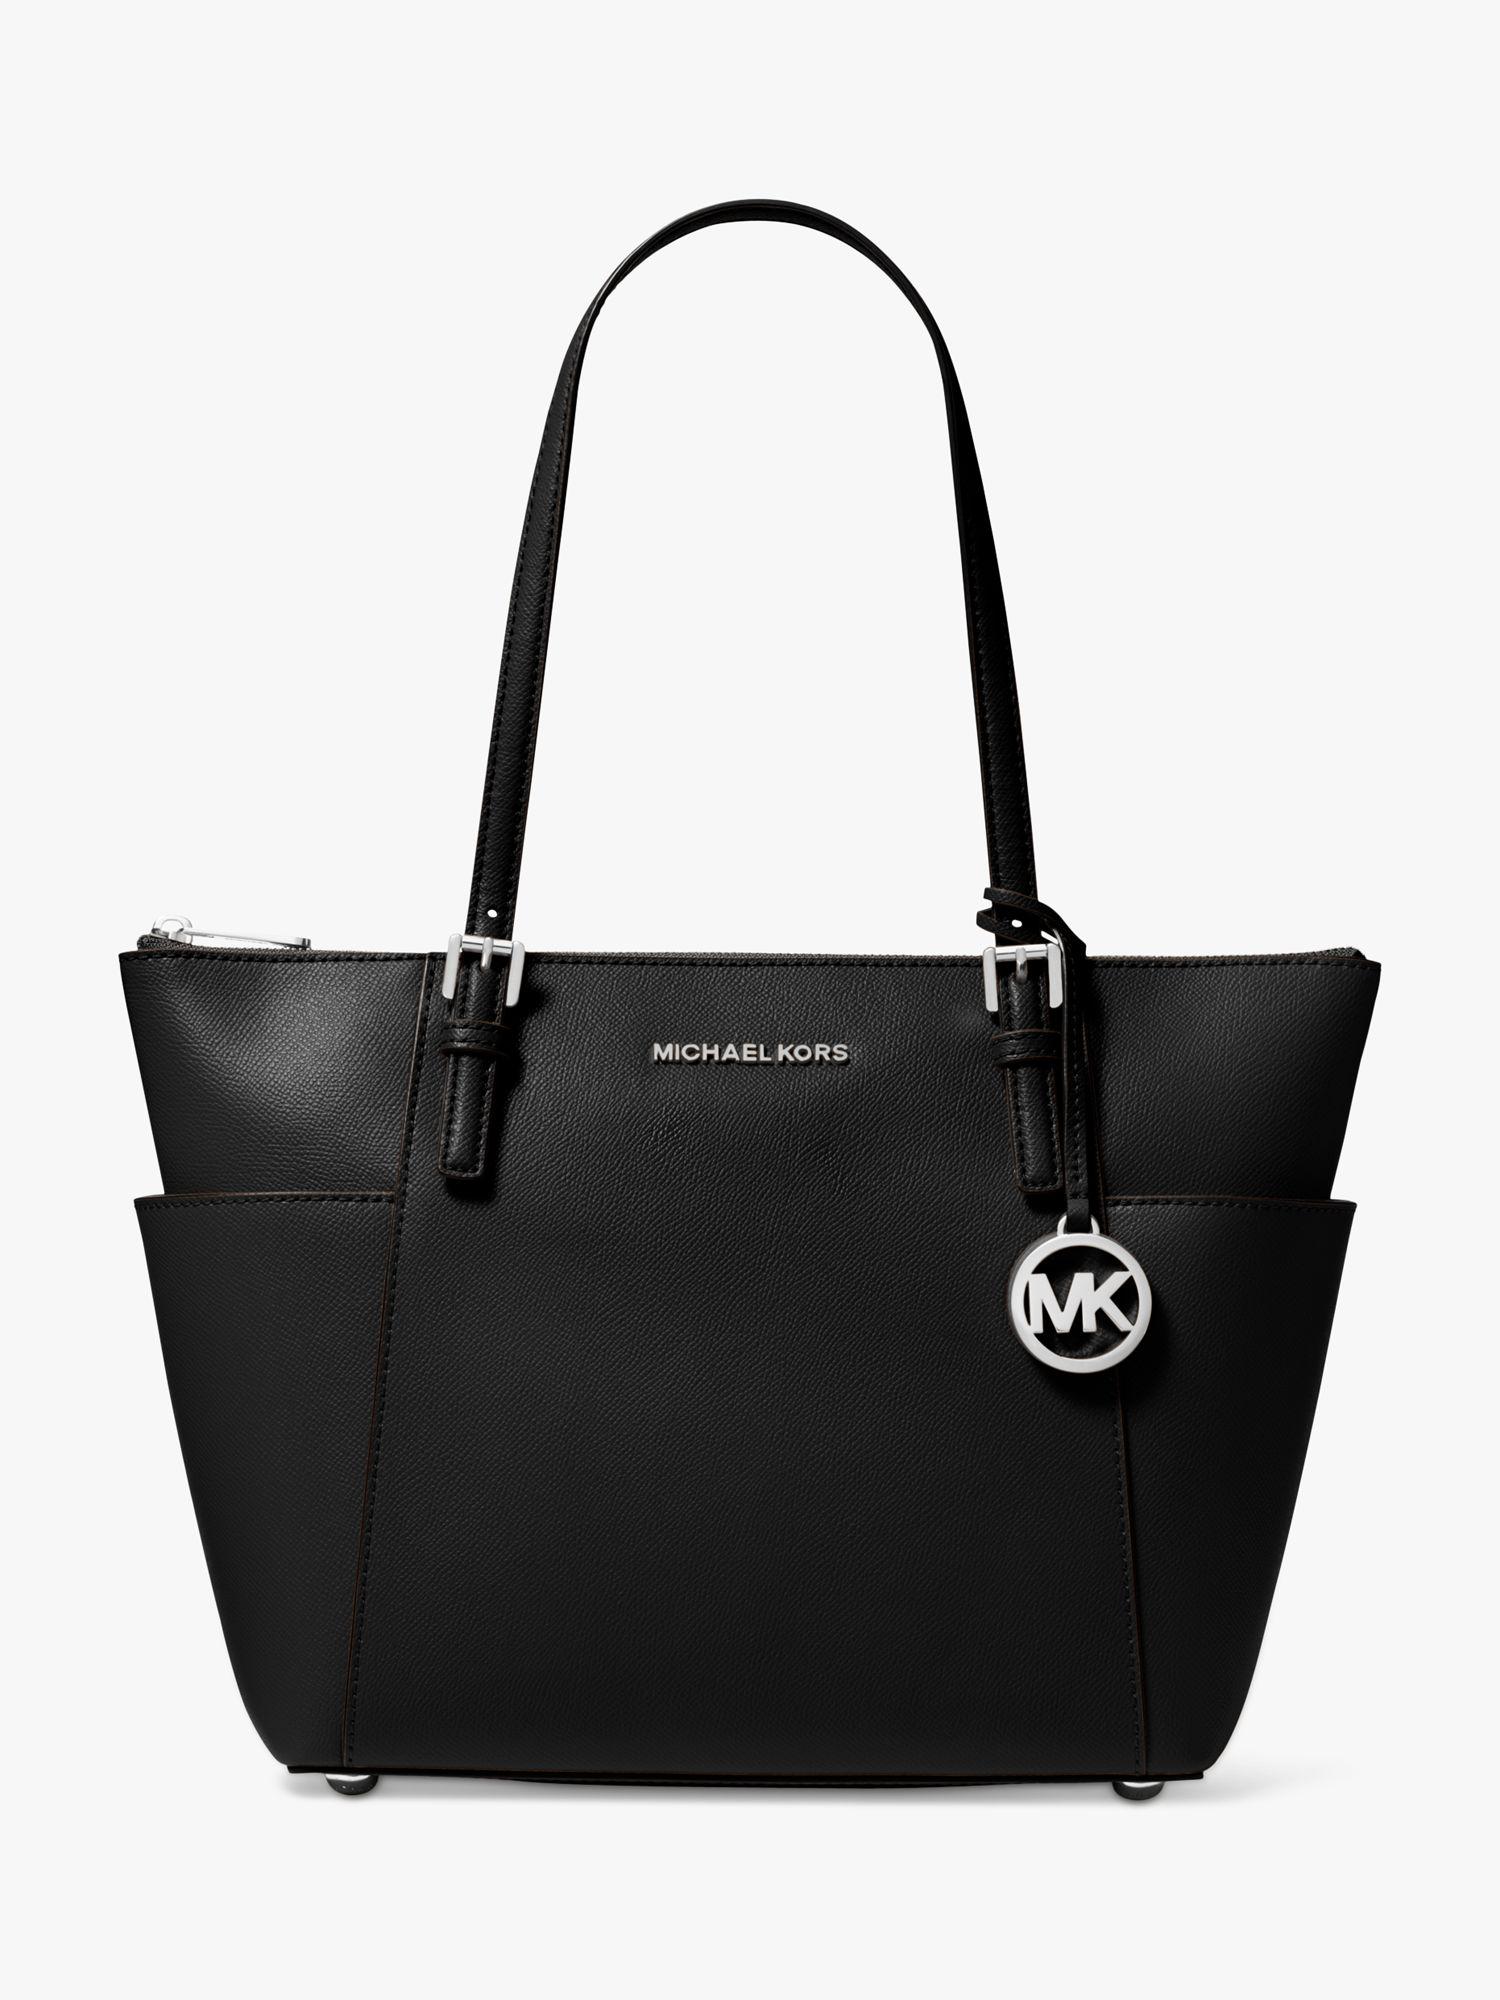 MICHAEL Michael Kors Jet Set EastWest Leather Tote Bag, Black